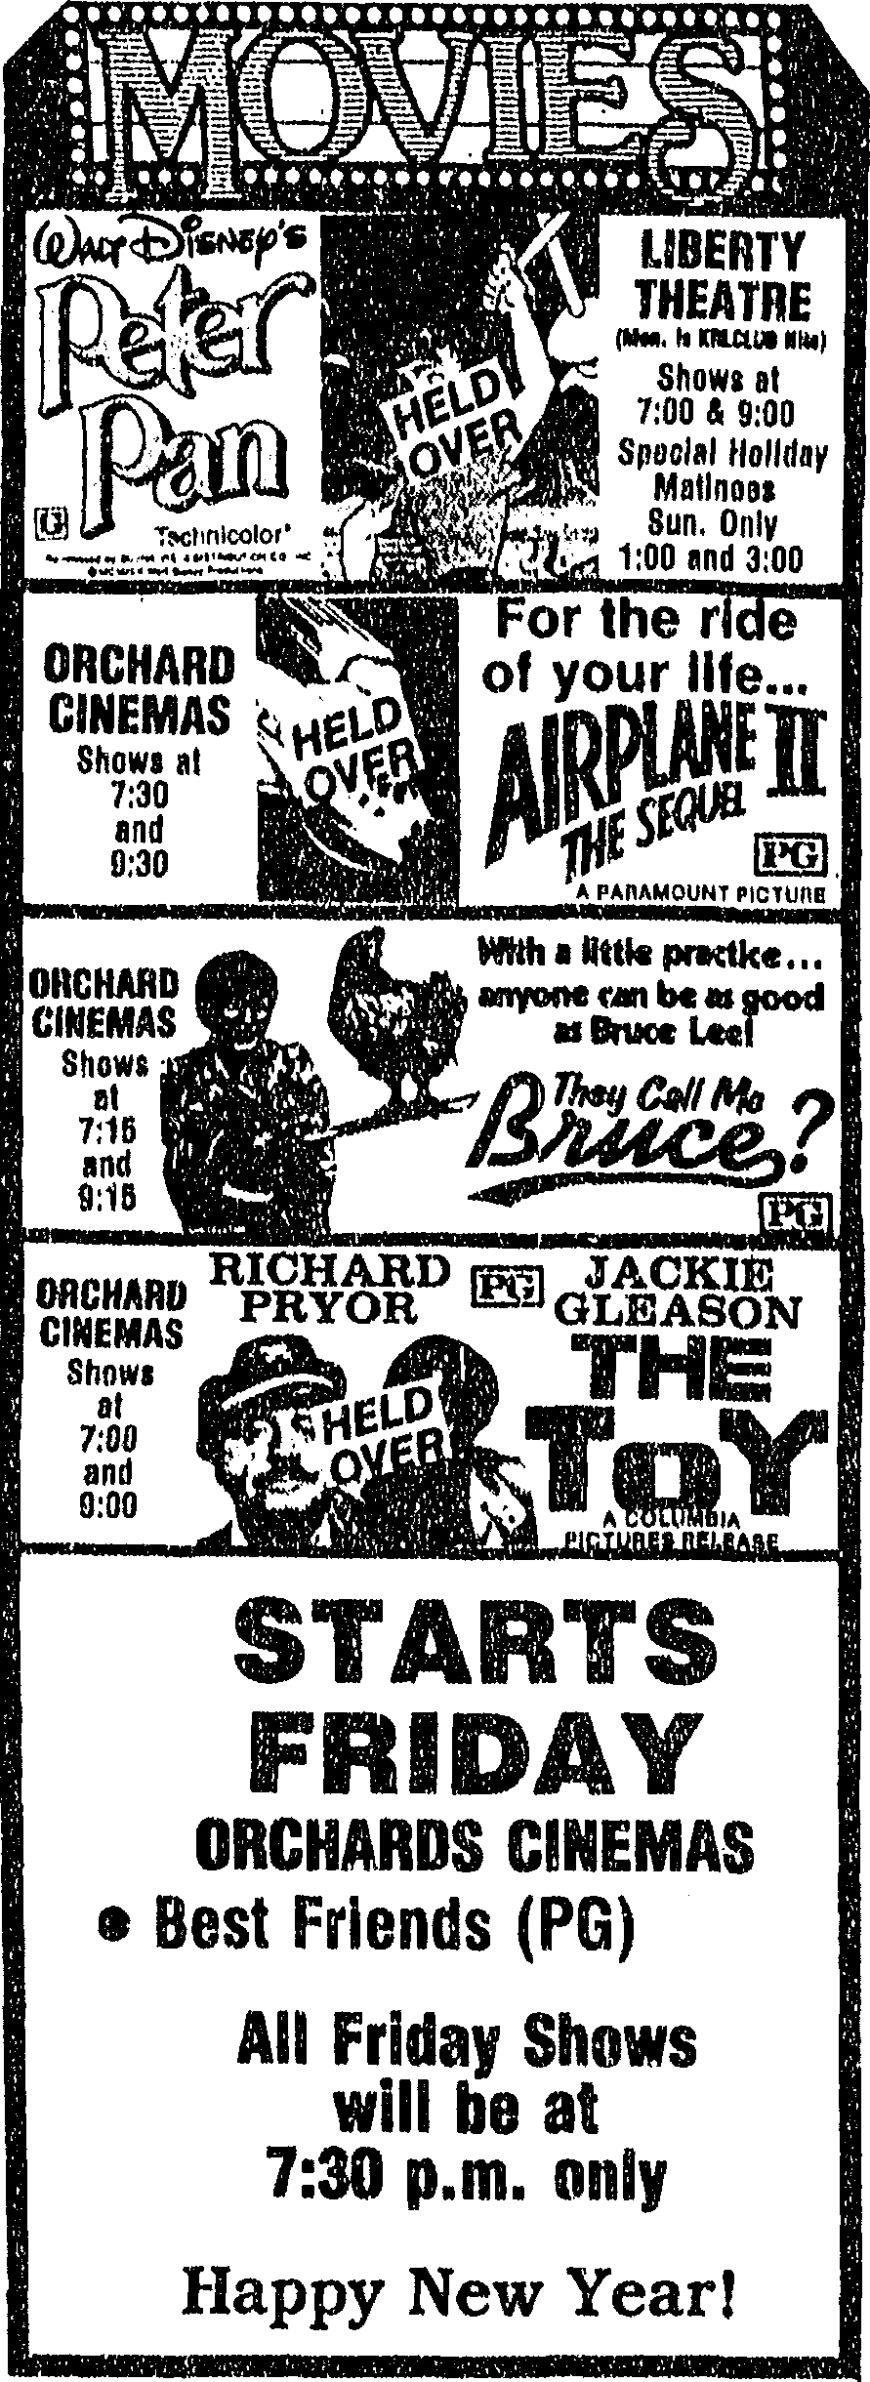 FB 12301982 Movies.jpg